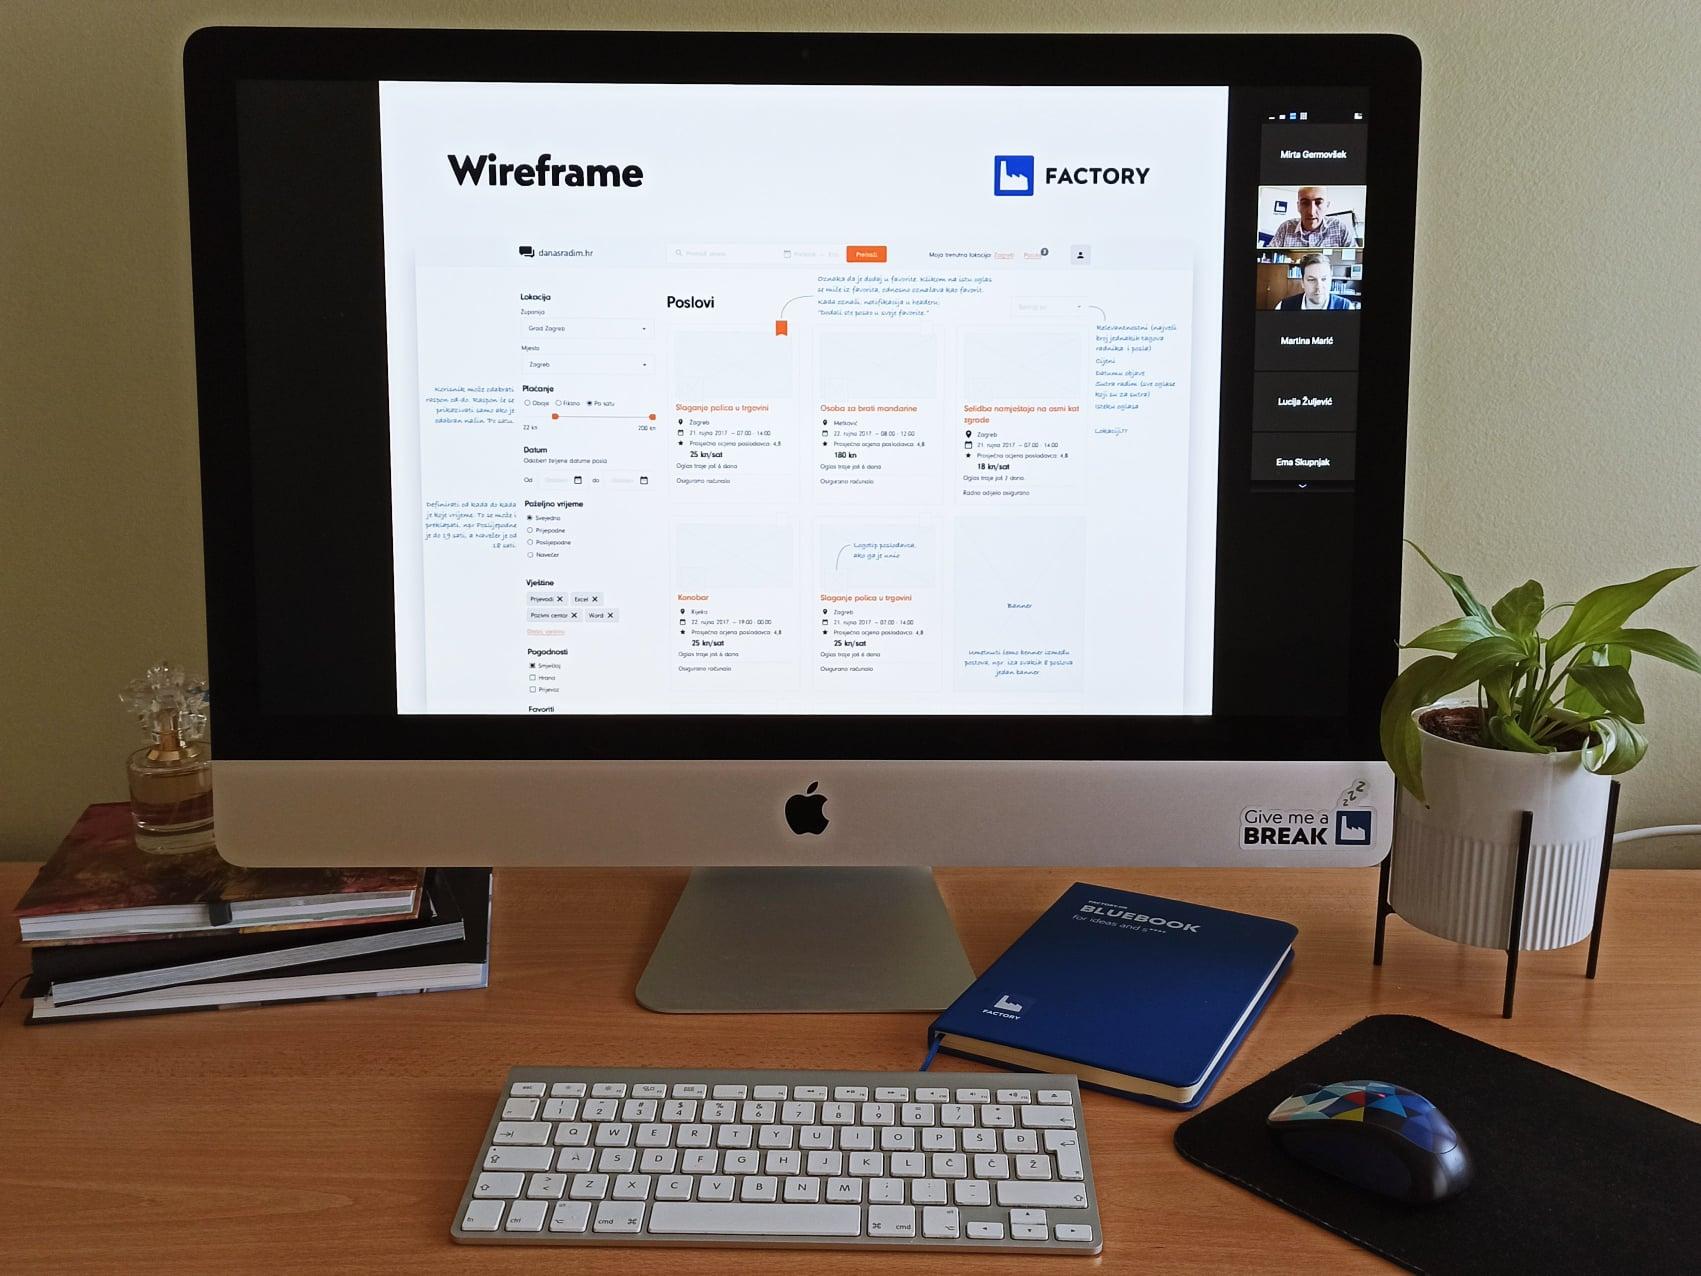 Online predavanje Factoryja o razvoju digitalnih proizvoda u suradnji s Ekonomskim fakultetom u Zagrebu